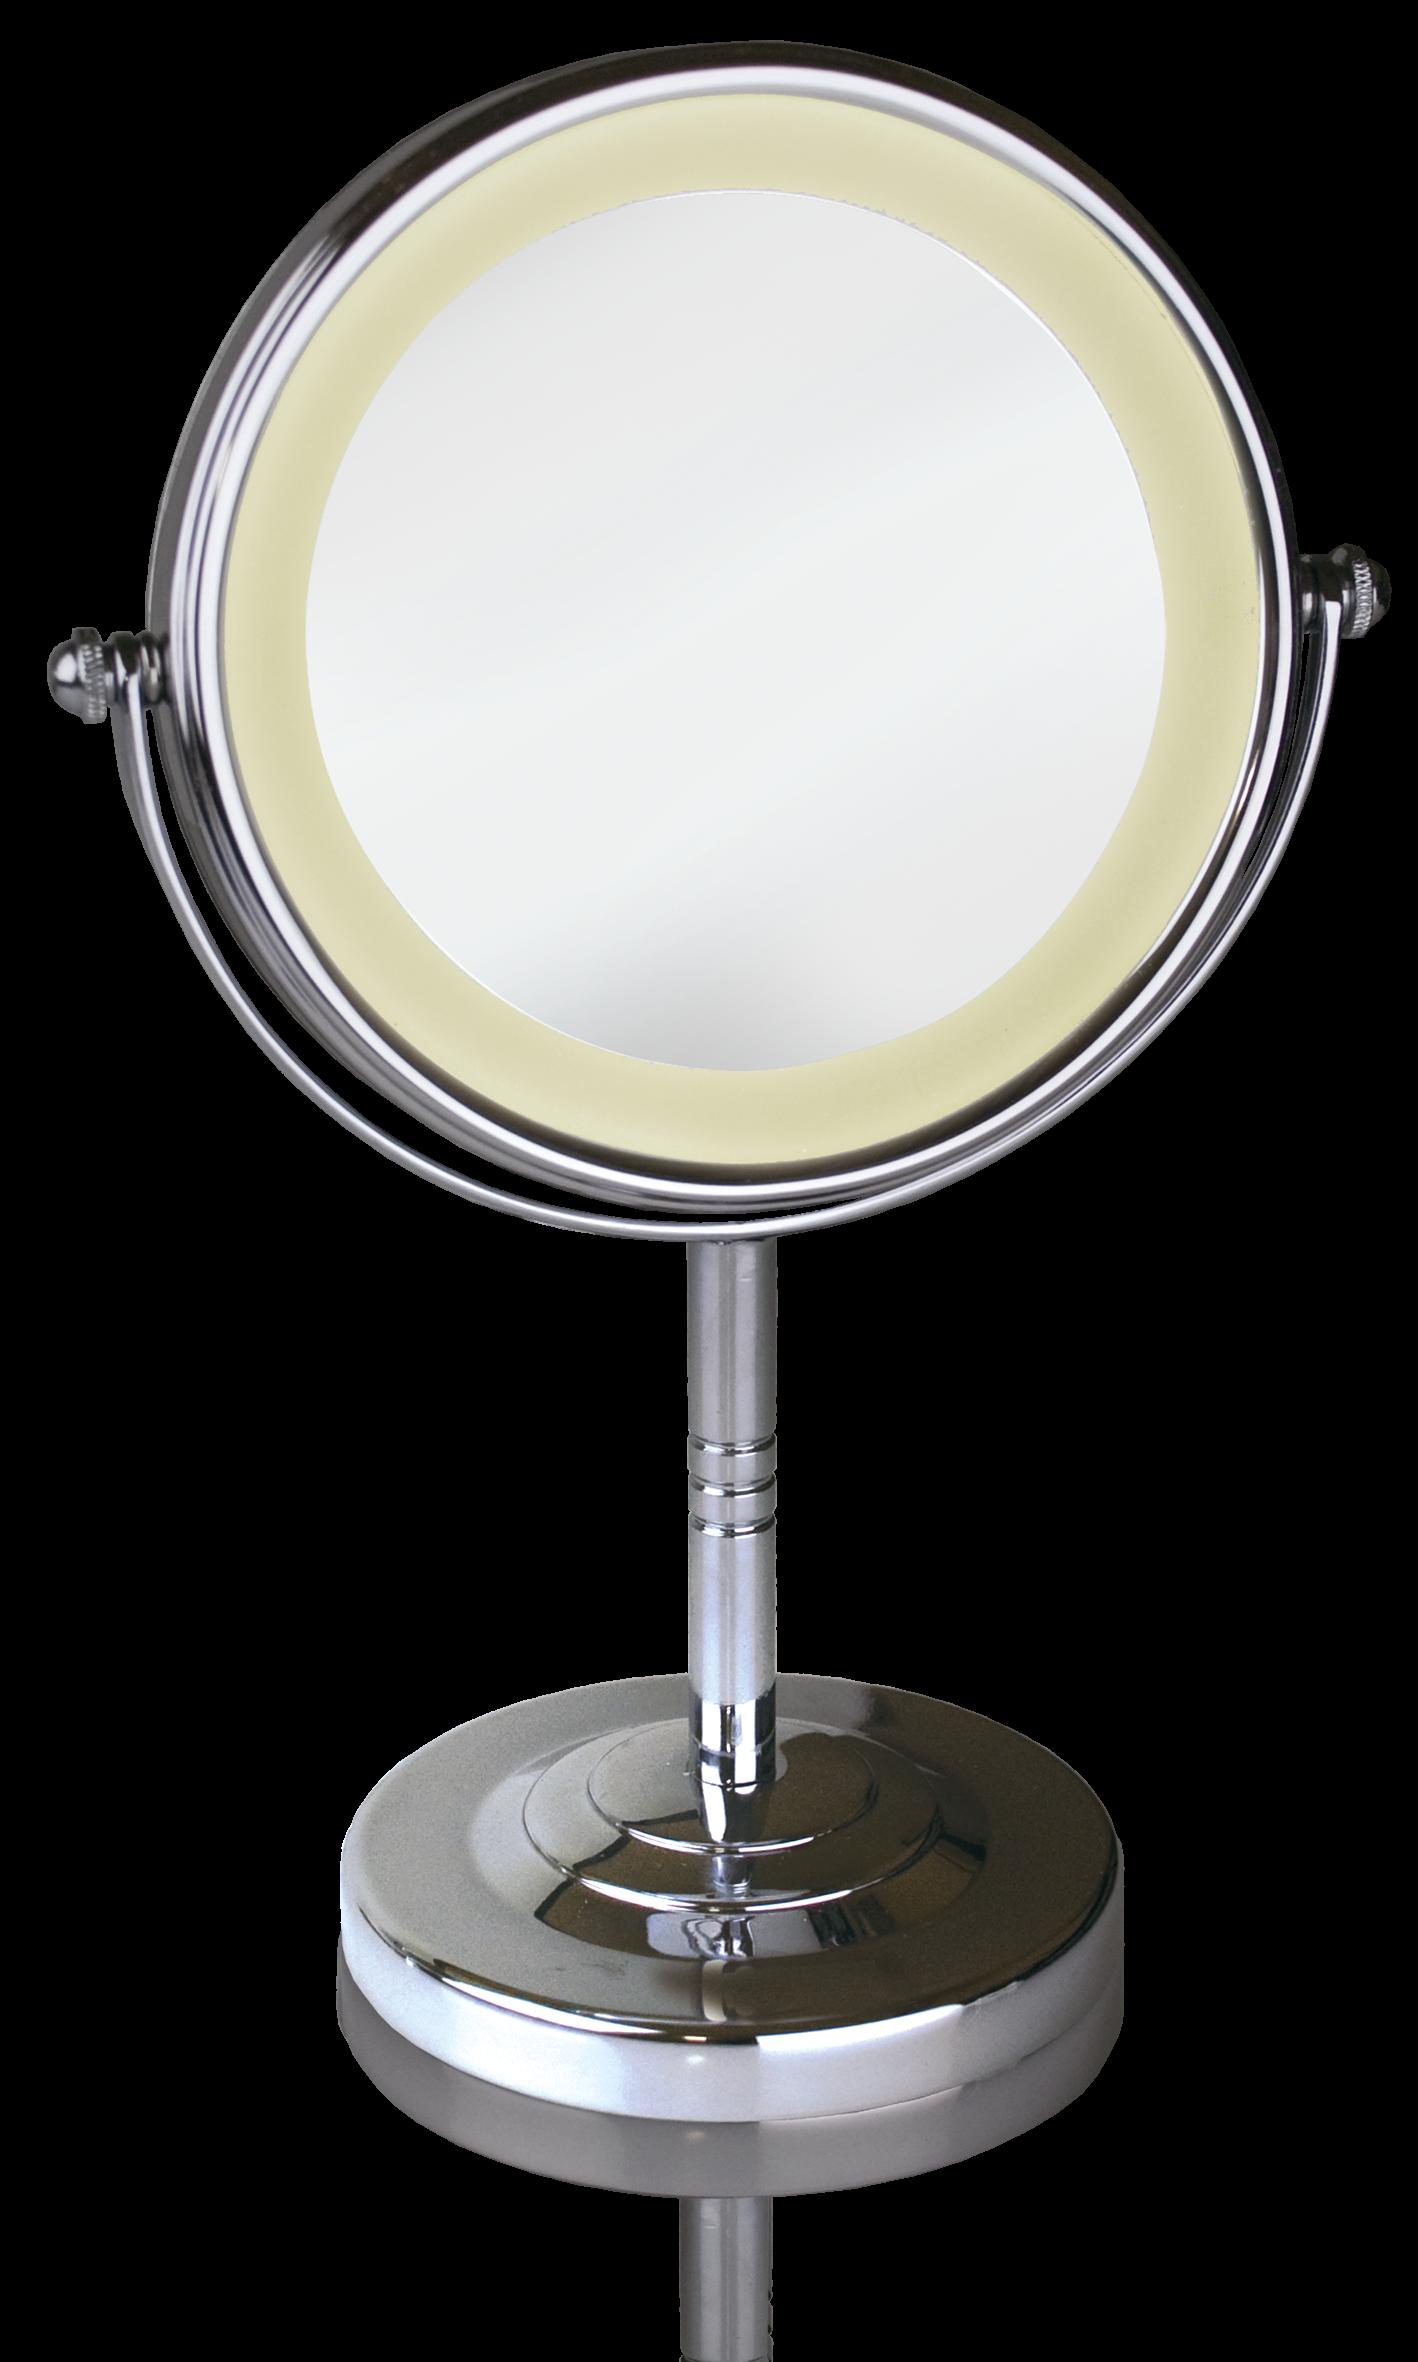 BaByliss - Makeup Mirror w. LED Light